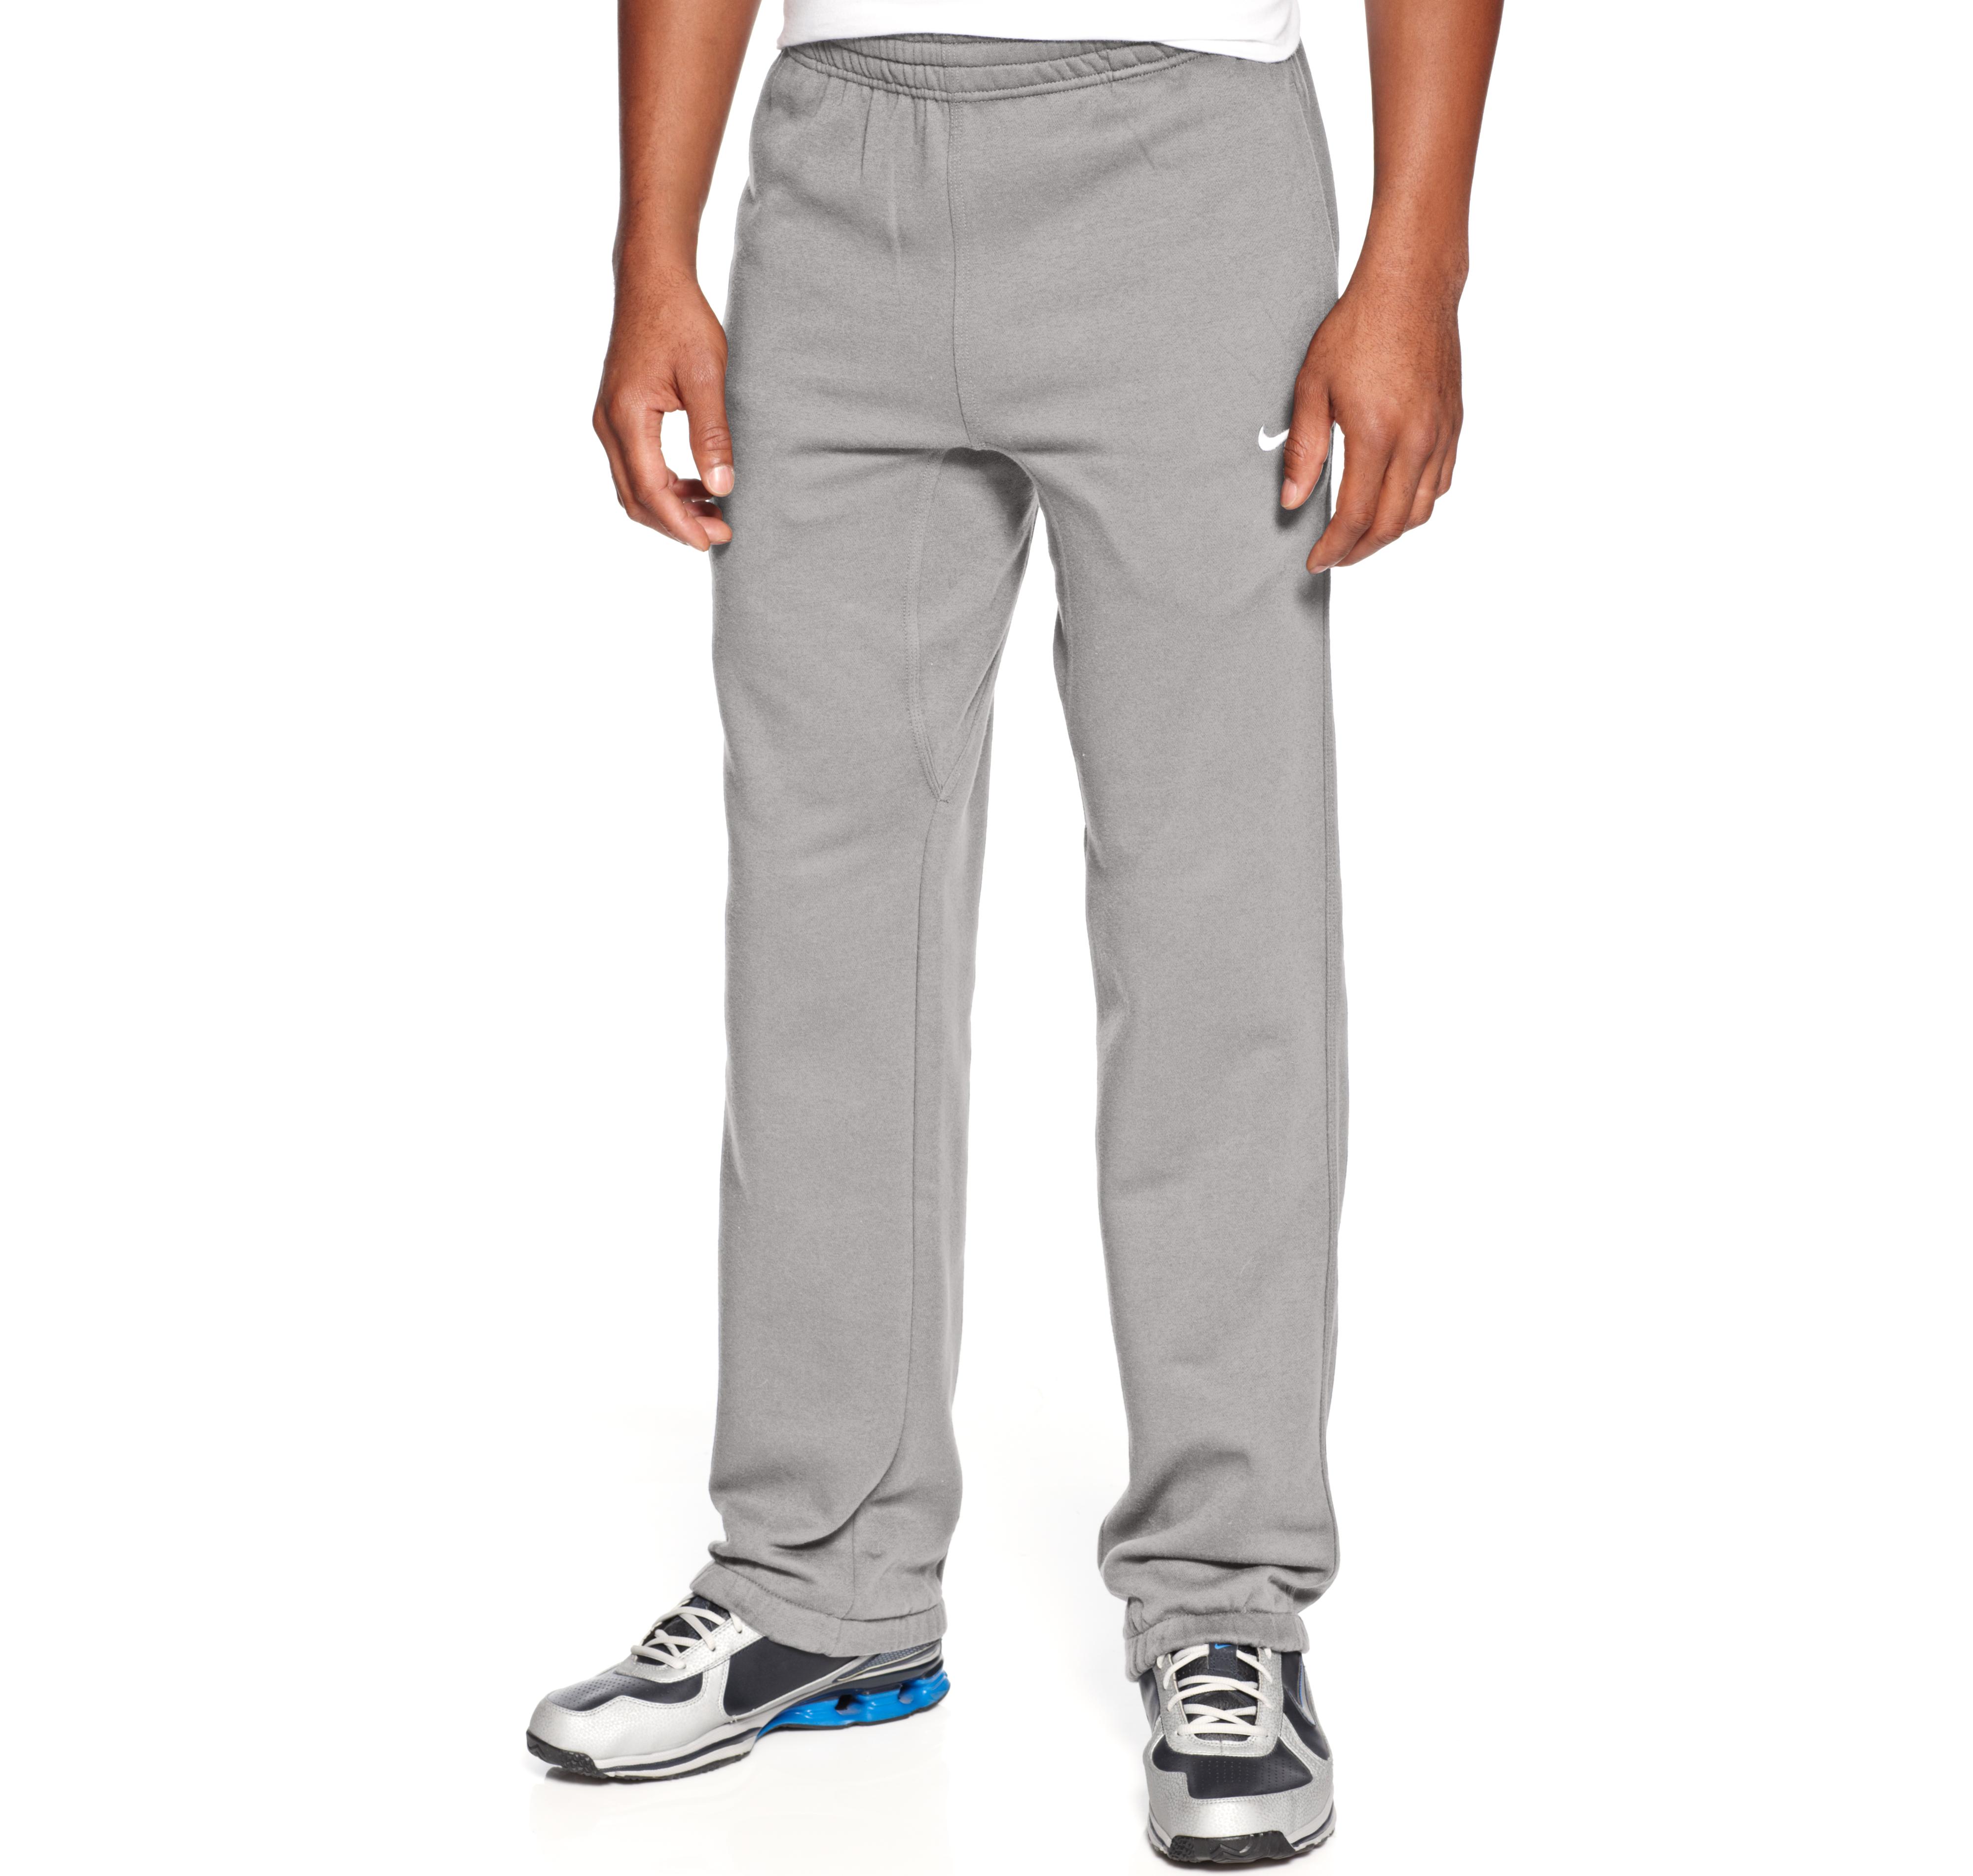 Nike Sweatpants, Fleece Cuff Pants